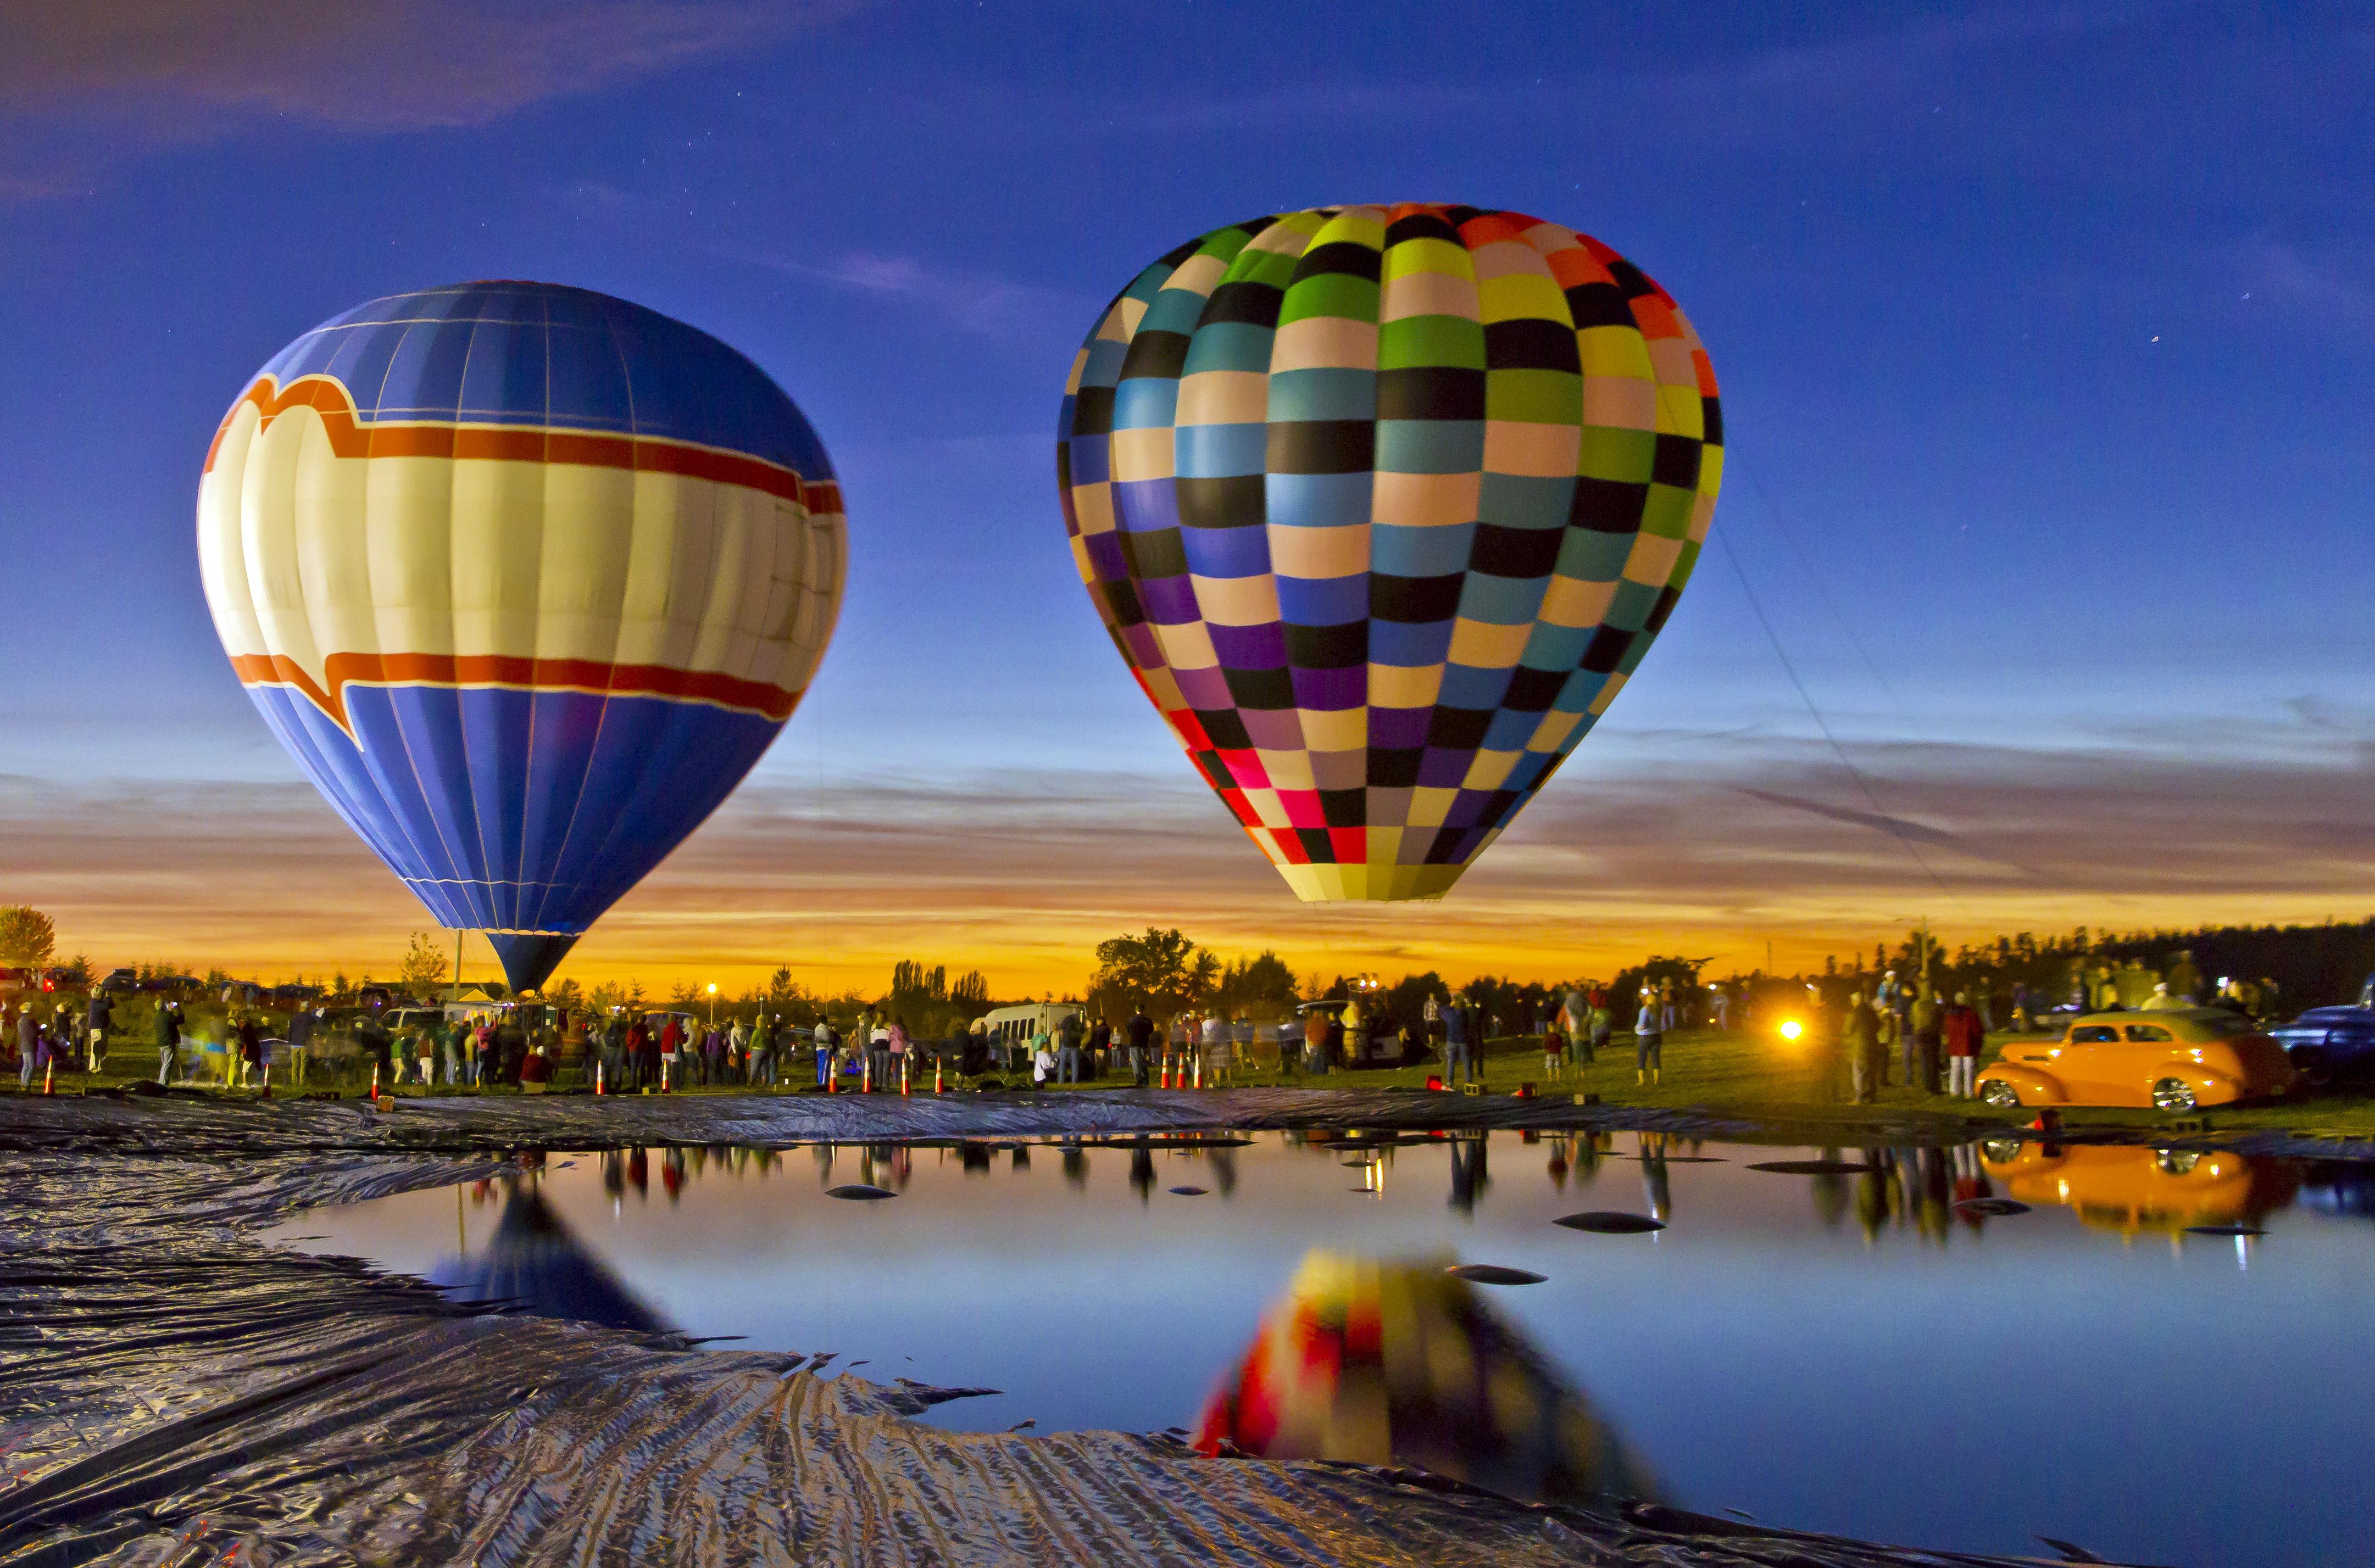 digital balloons festival image